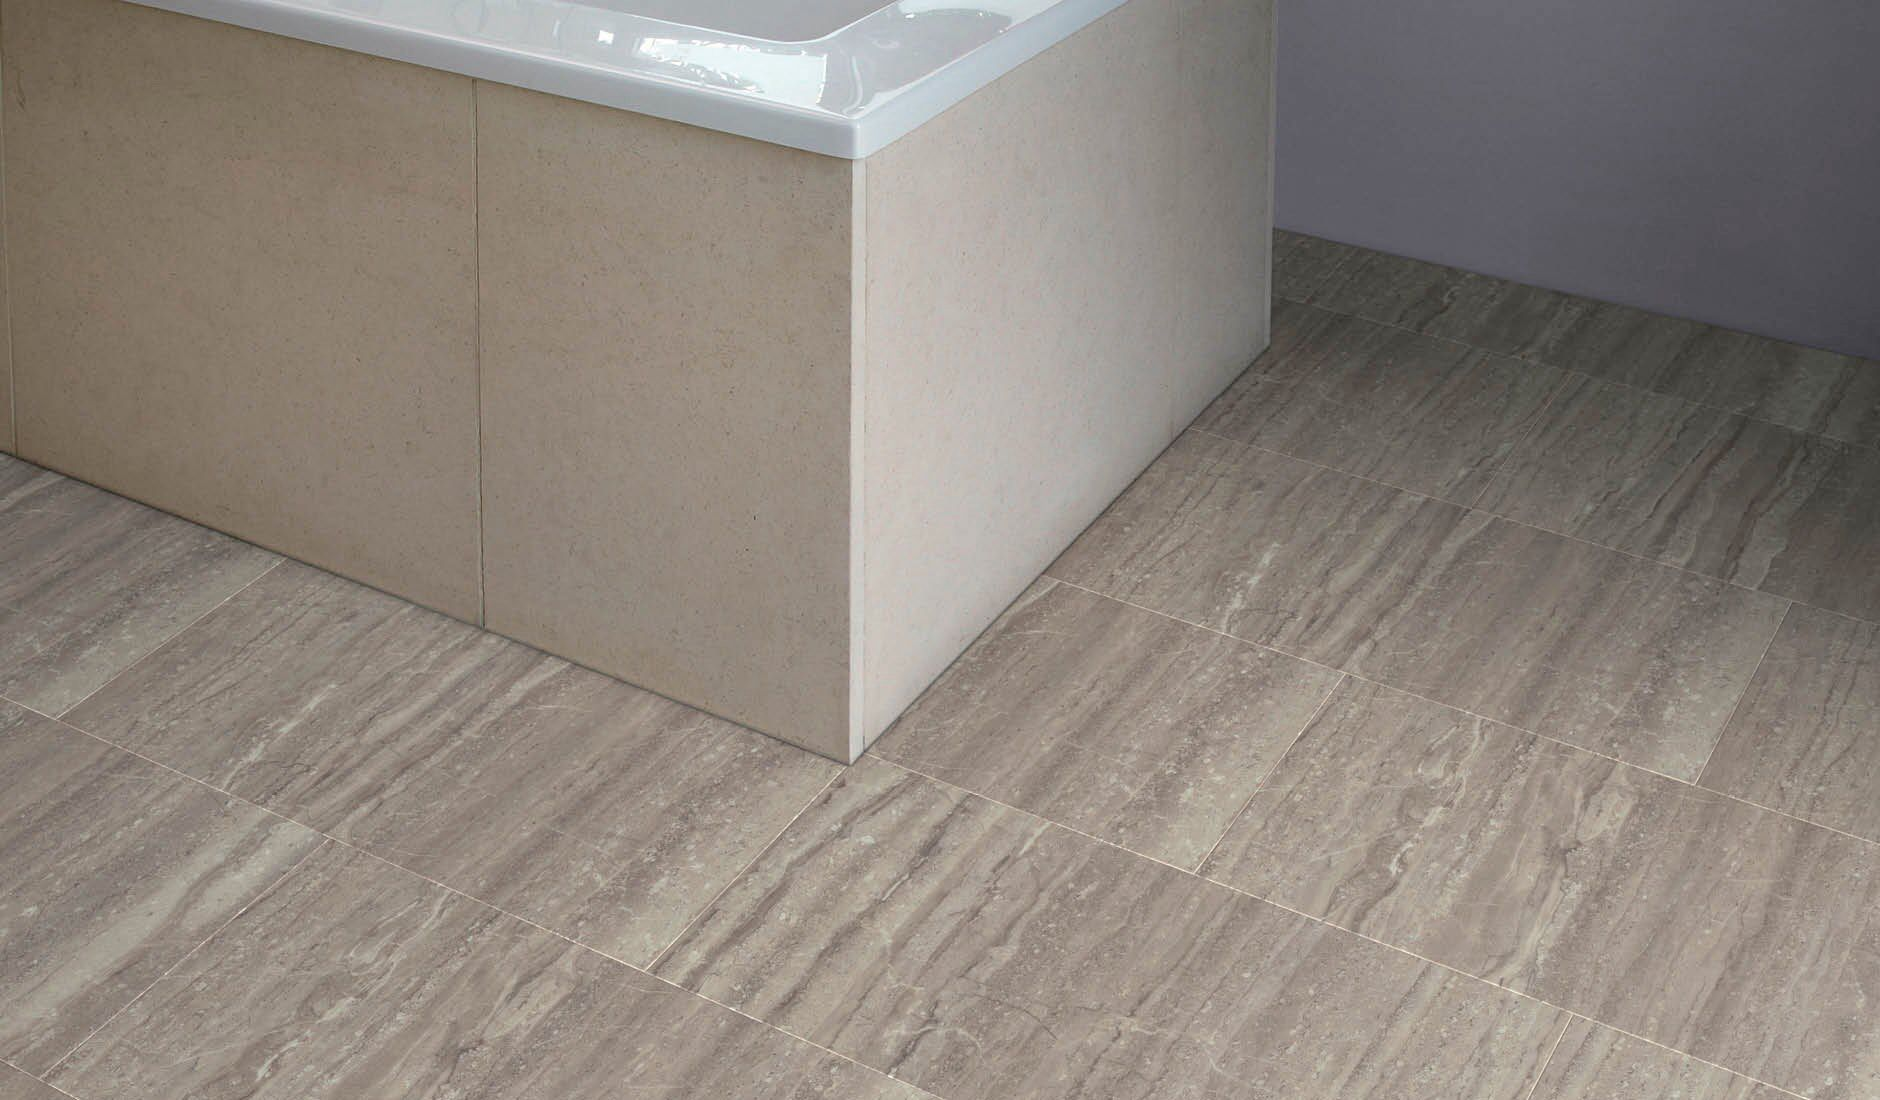 Image from http://www.amtico.com/images/en-gb/stone-flooring-bathroom-doric-marble-01/stone-floor-tiles-doric-marble-in-a-bathroom.jpg?width=1880&height=1100&mode=crop.